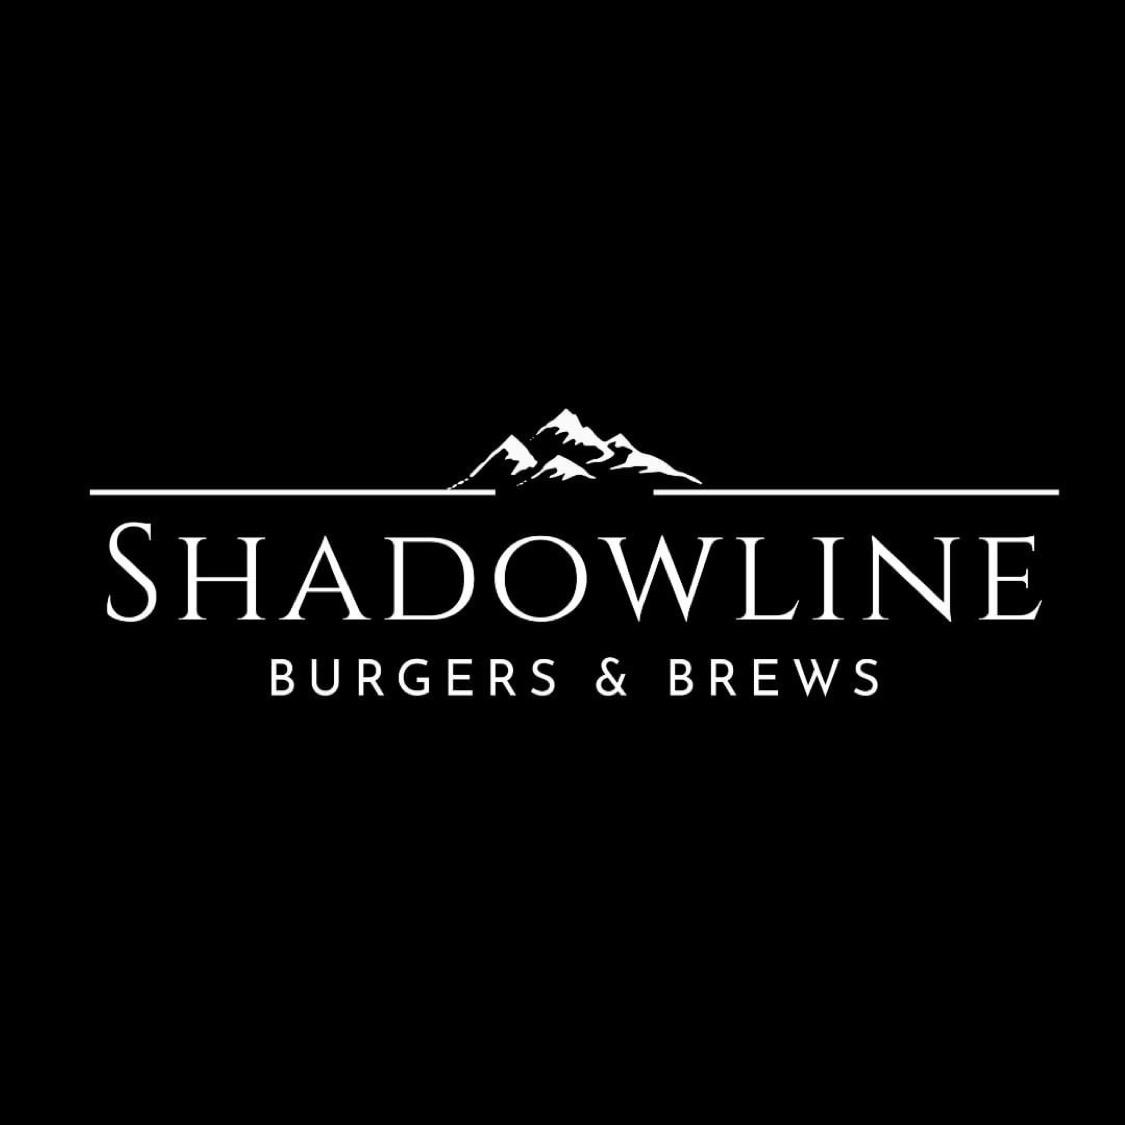 Shadowline Burgers and Brews